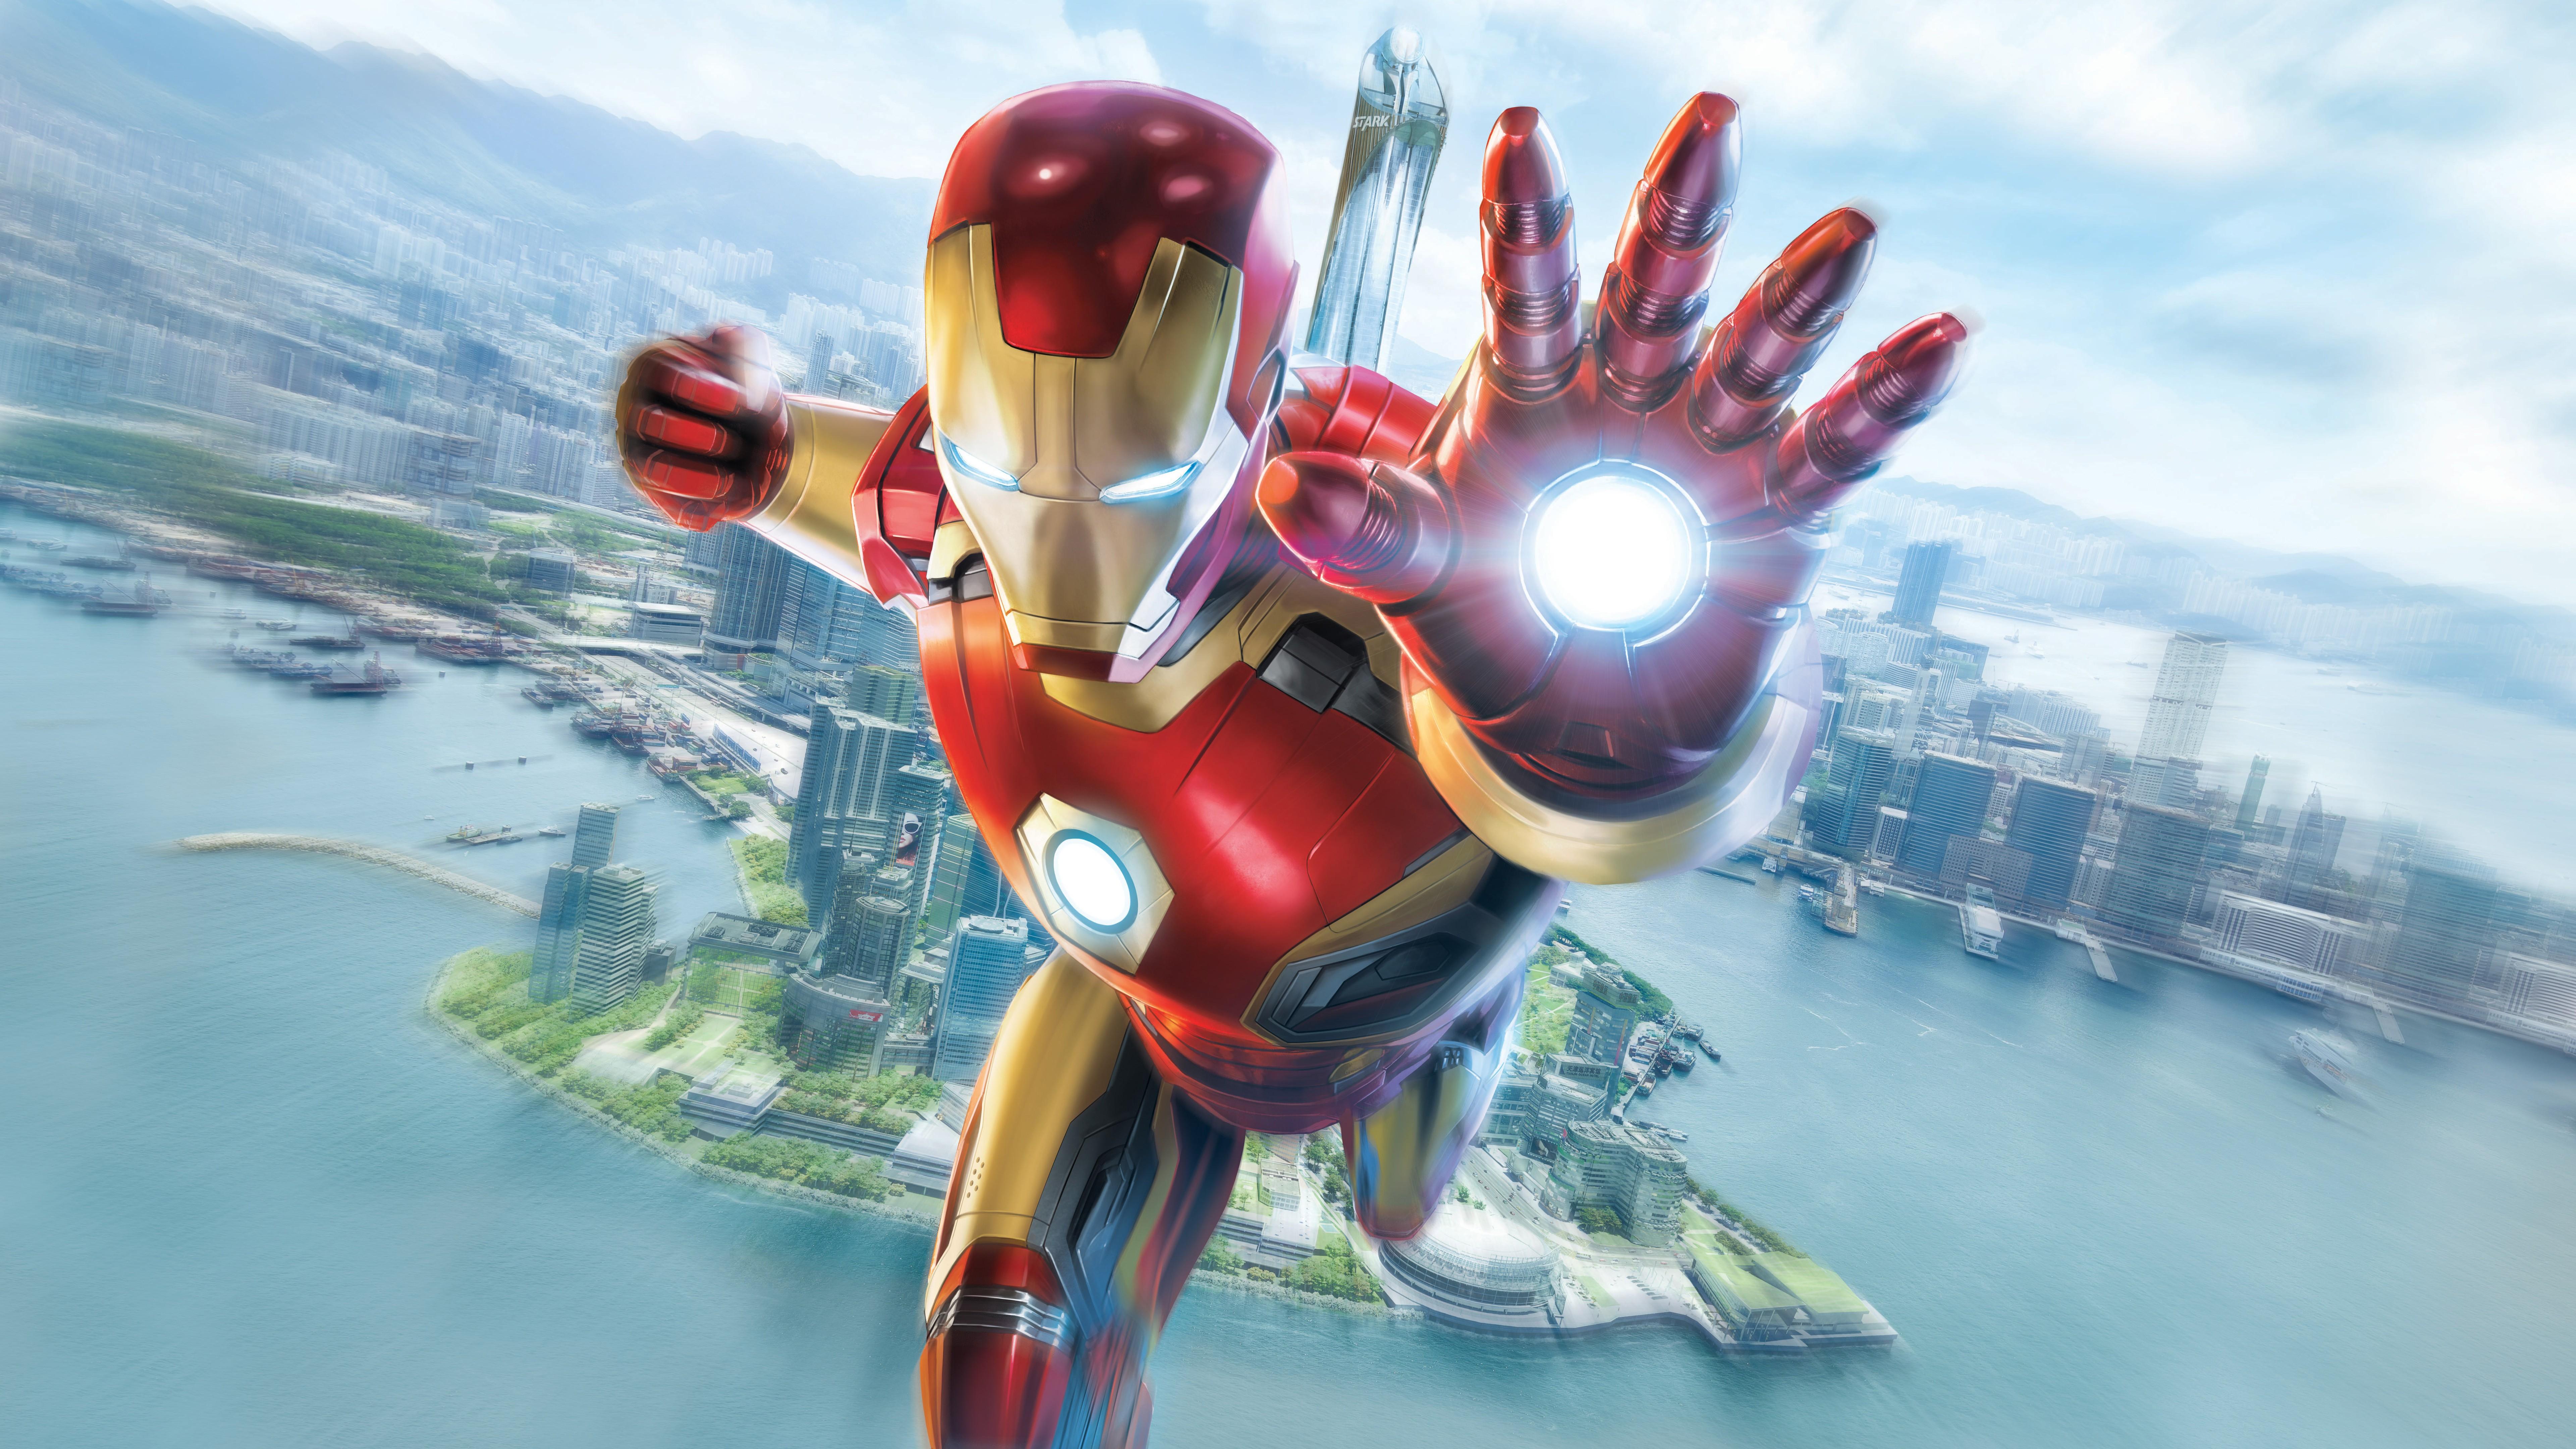 Iron Man 8k Ultra HD Wallpaper   Background Image   7680x4320   ID:926671 - Wallpaper Abyss